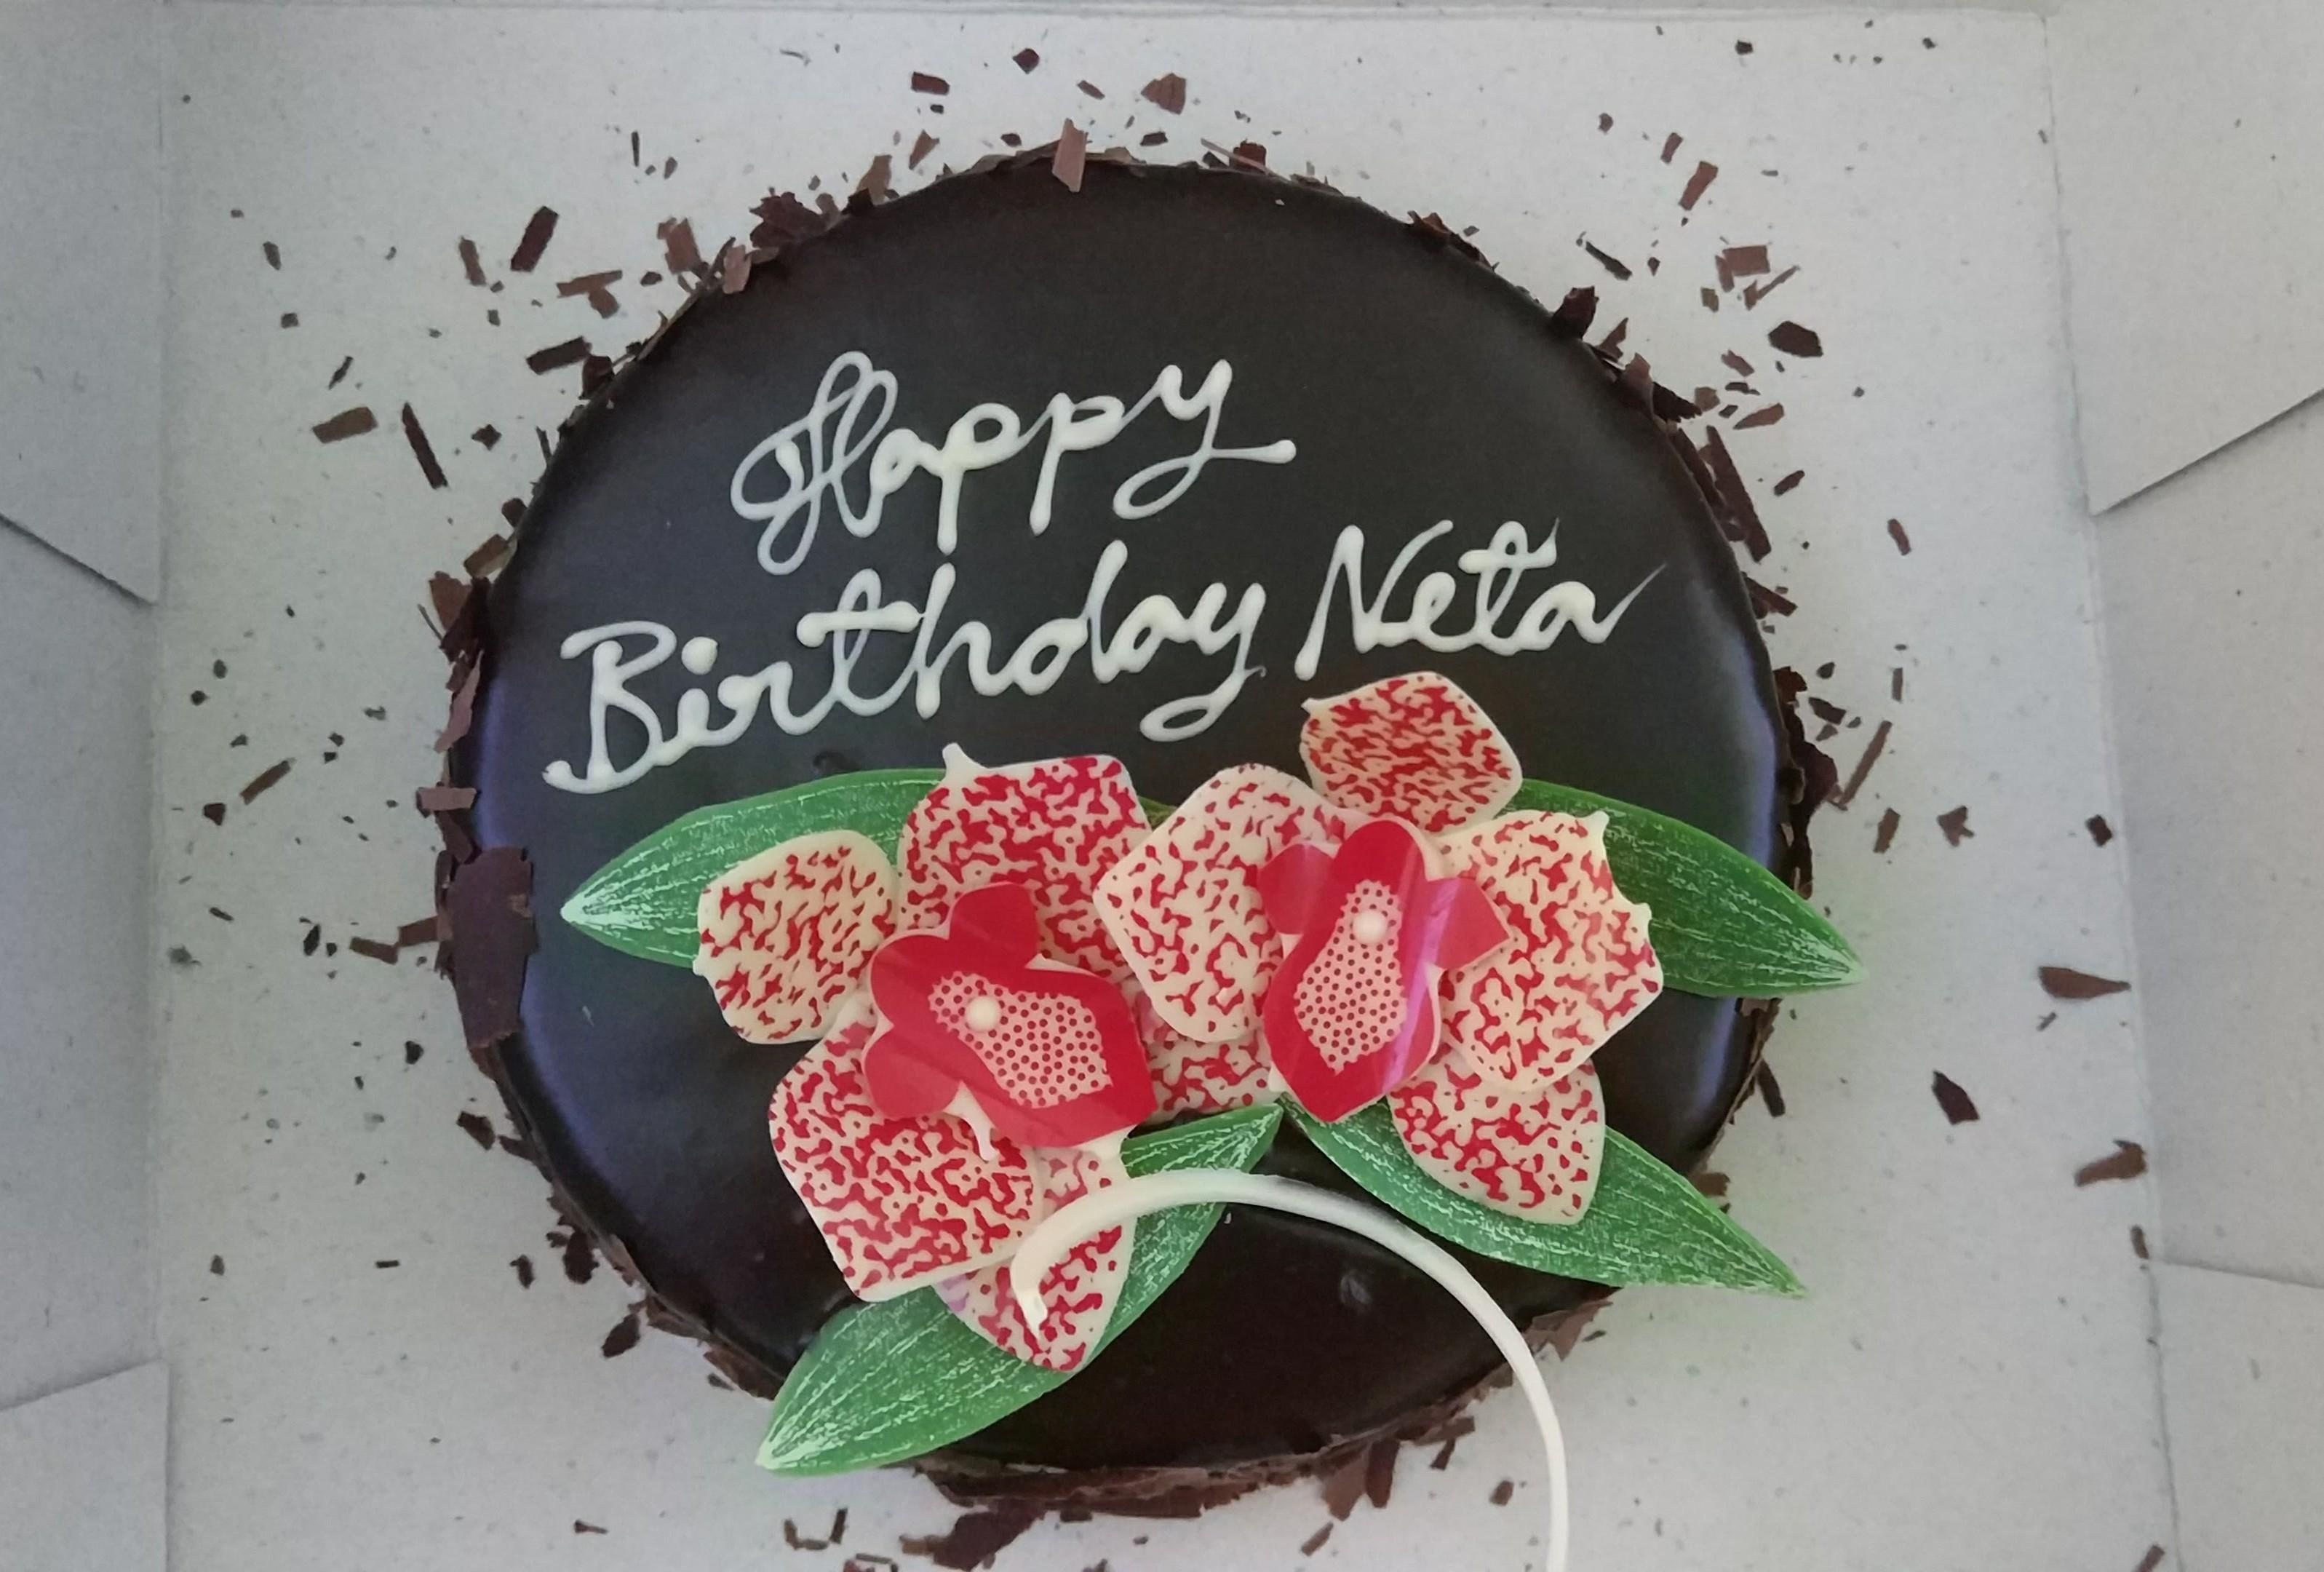 Cathay Pacific Birthday Cake